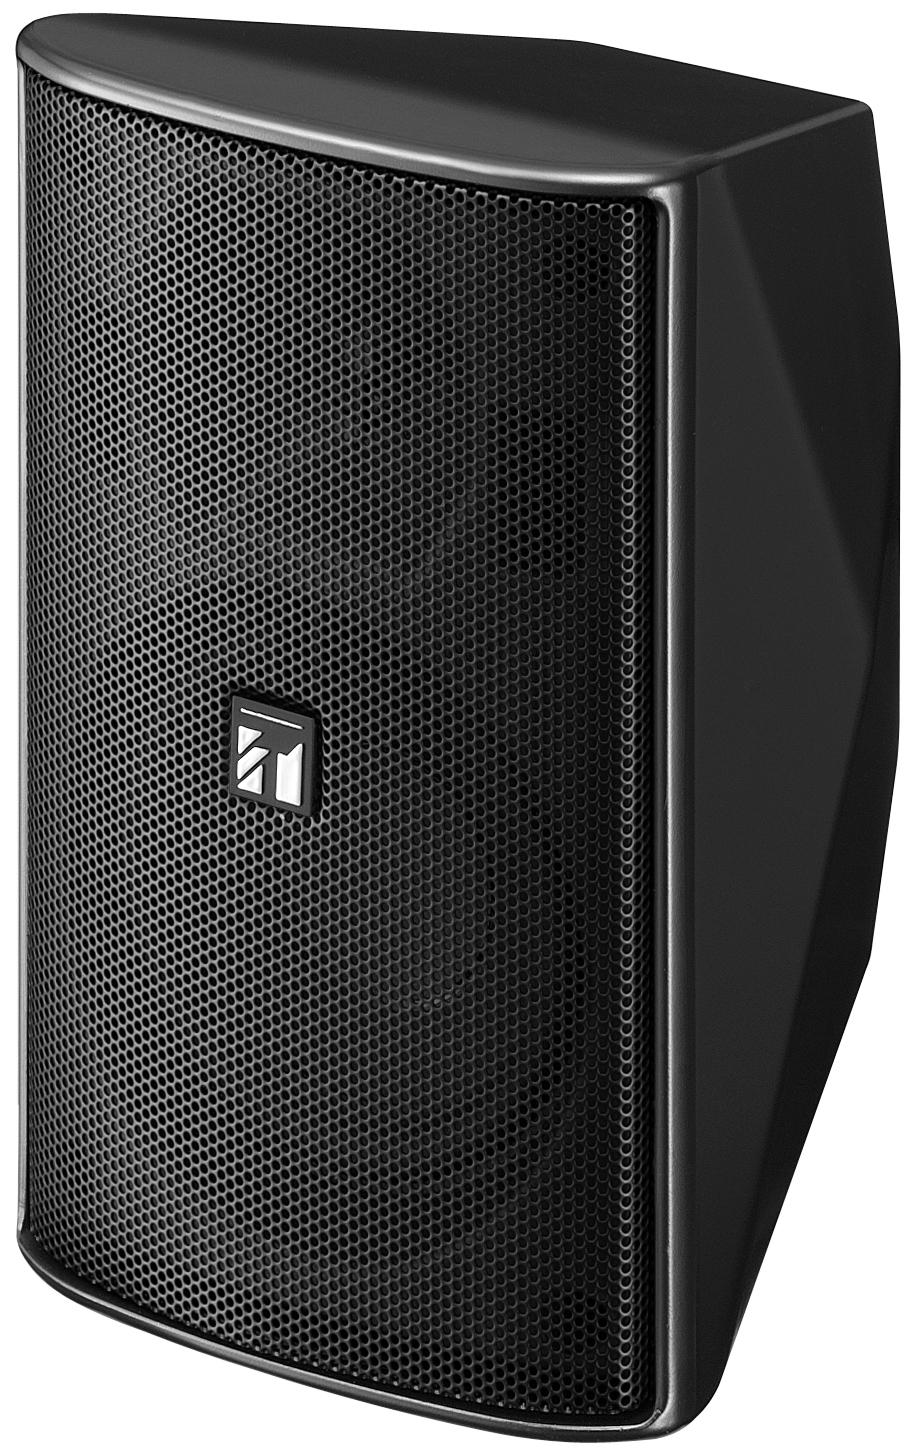 Pro Audio Speakers Wide Dispersion Box Speakers F